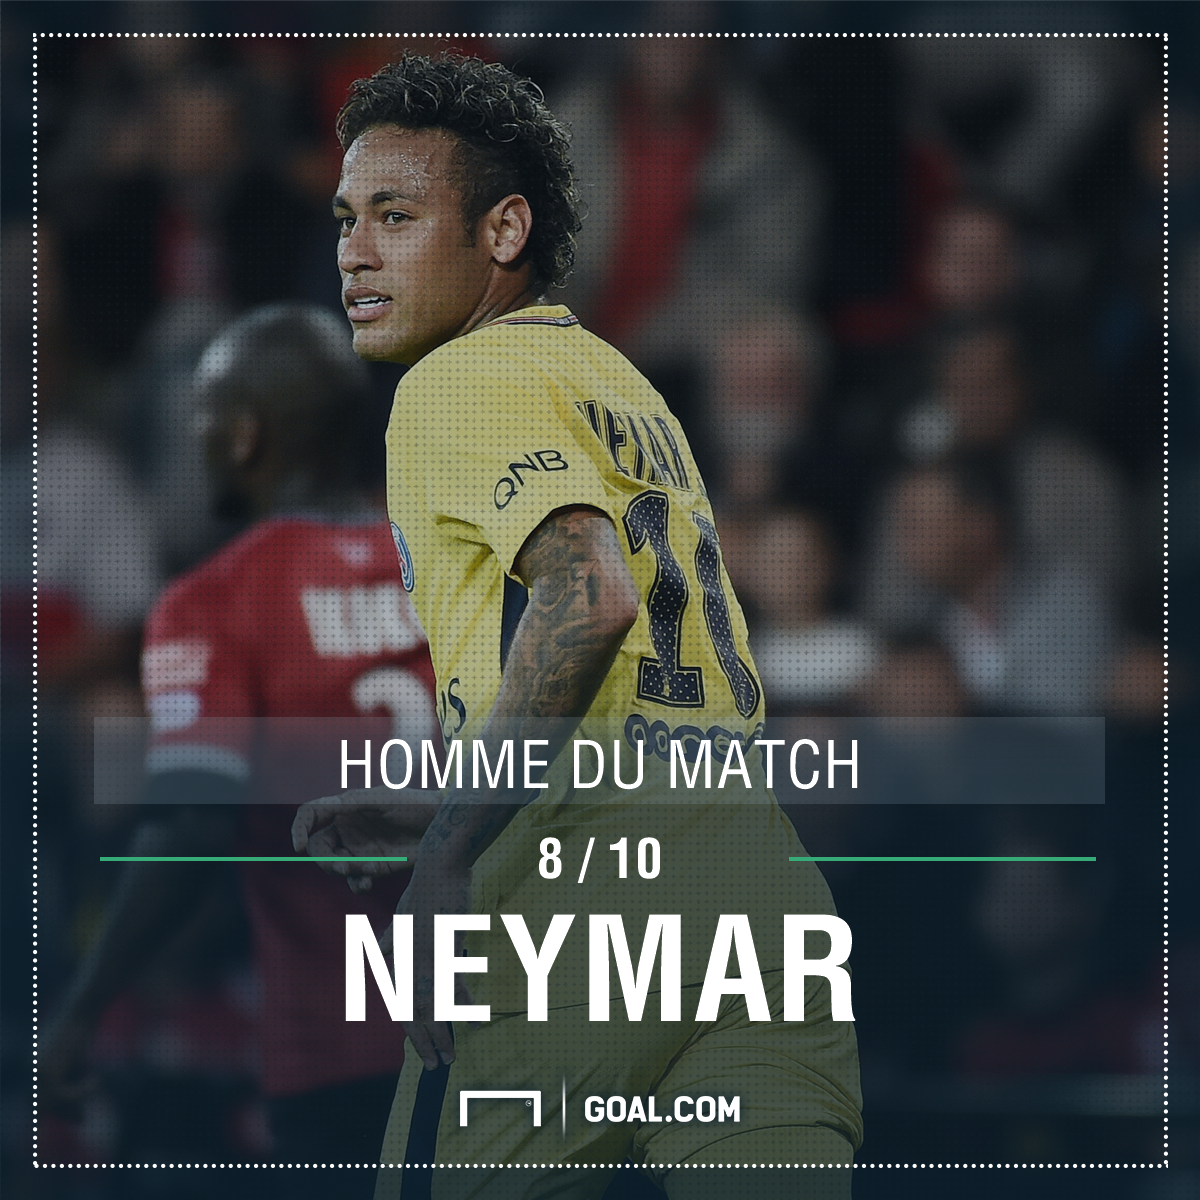 PS Neymar